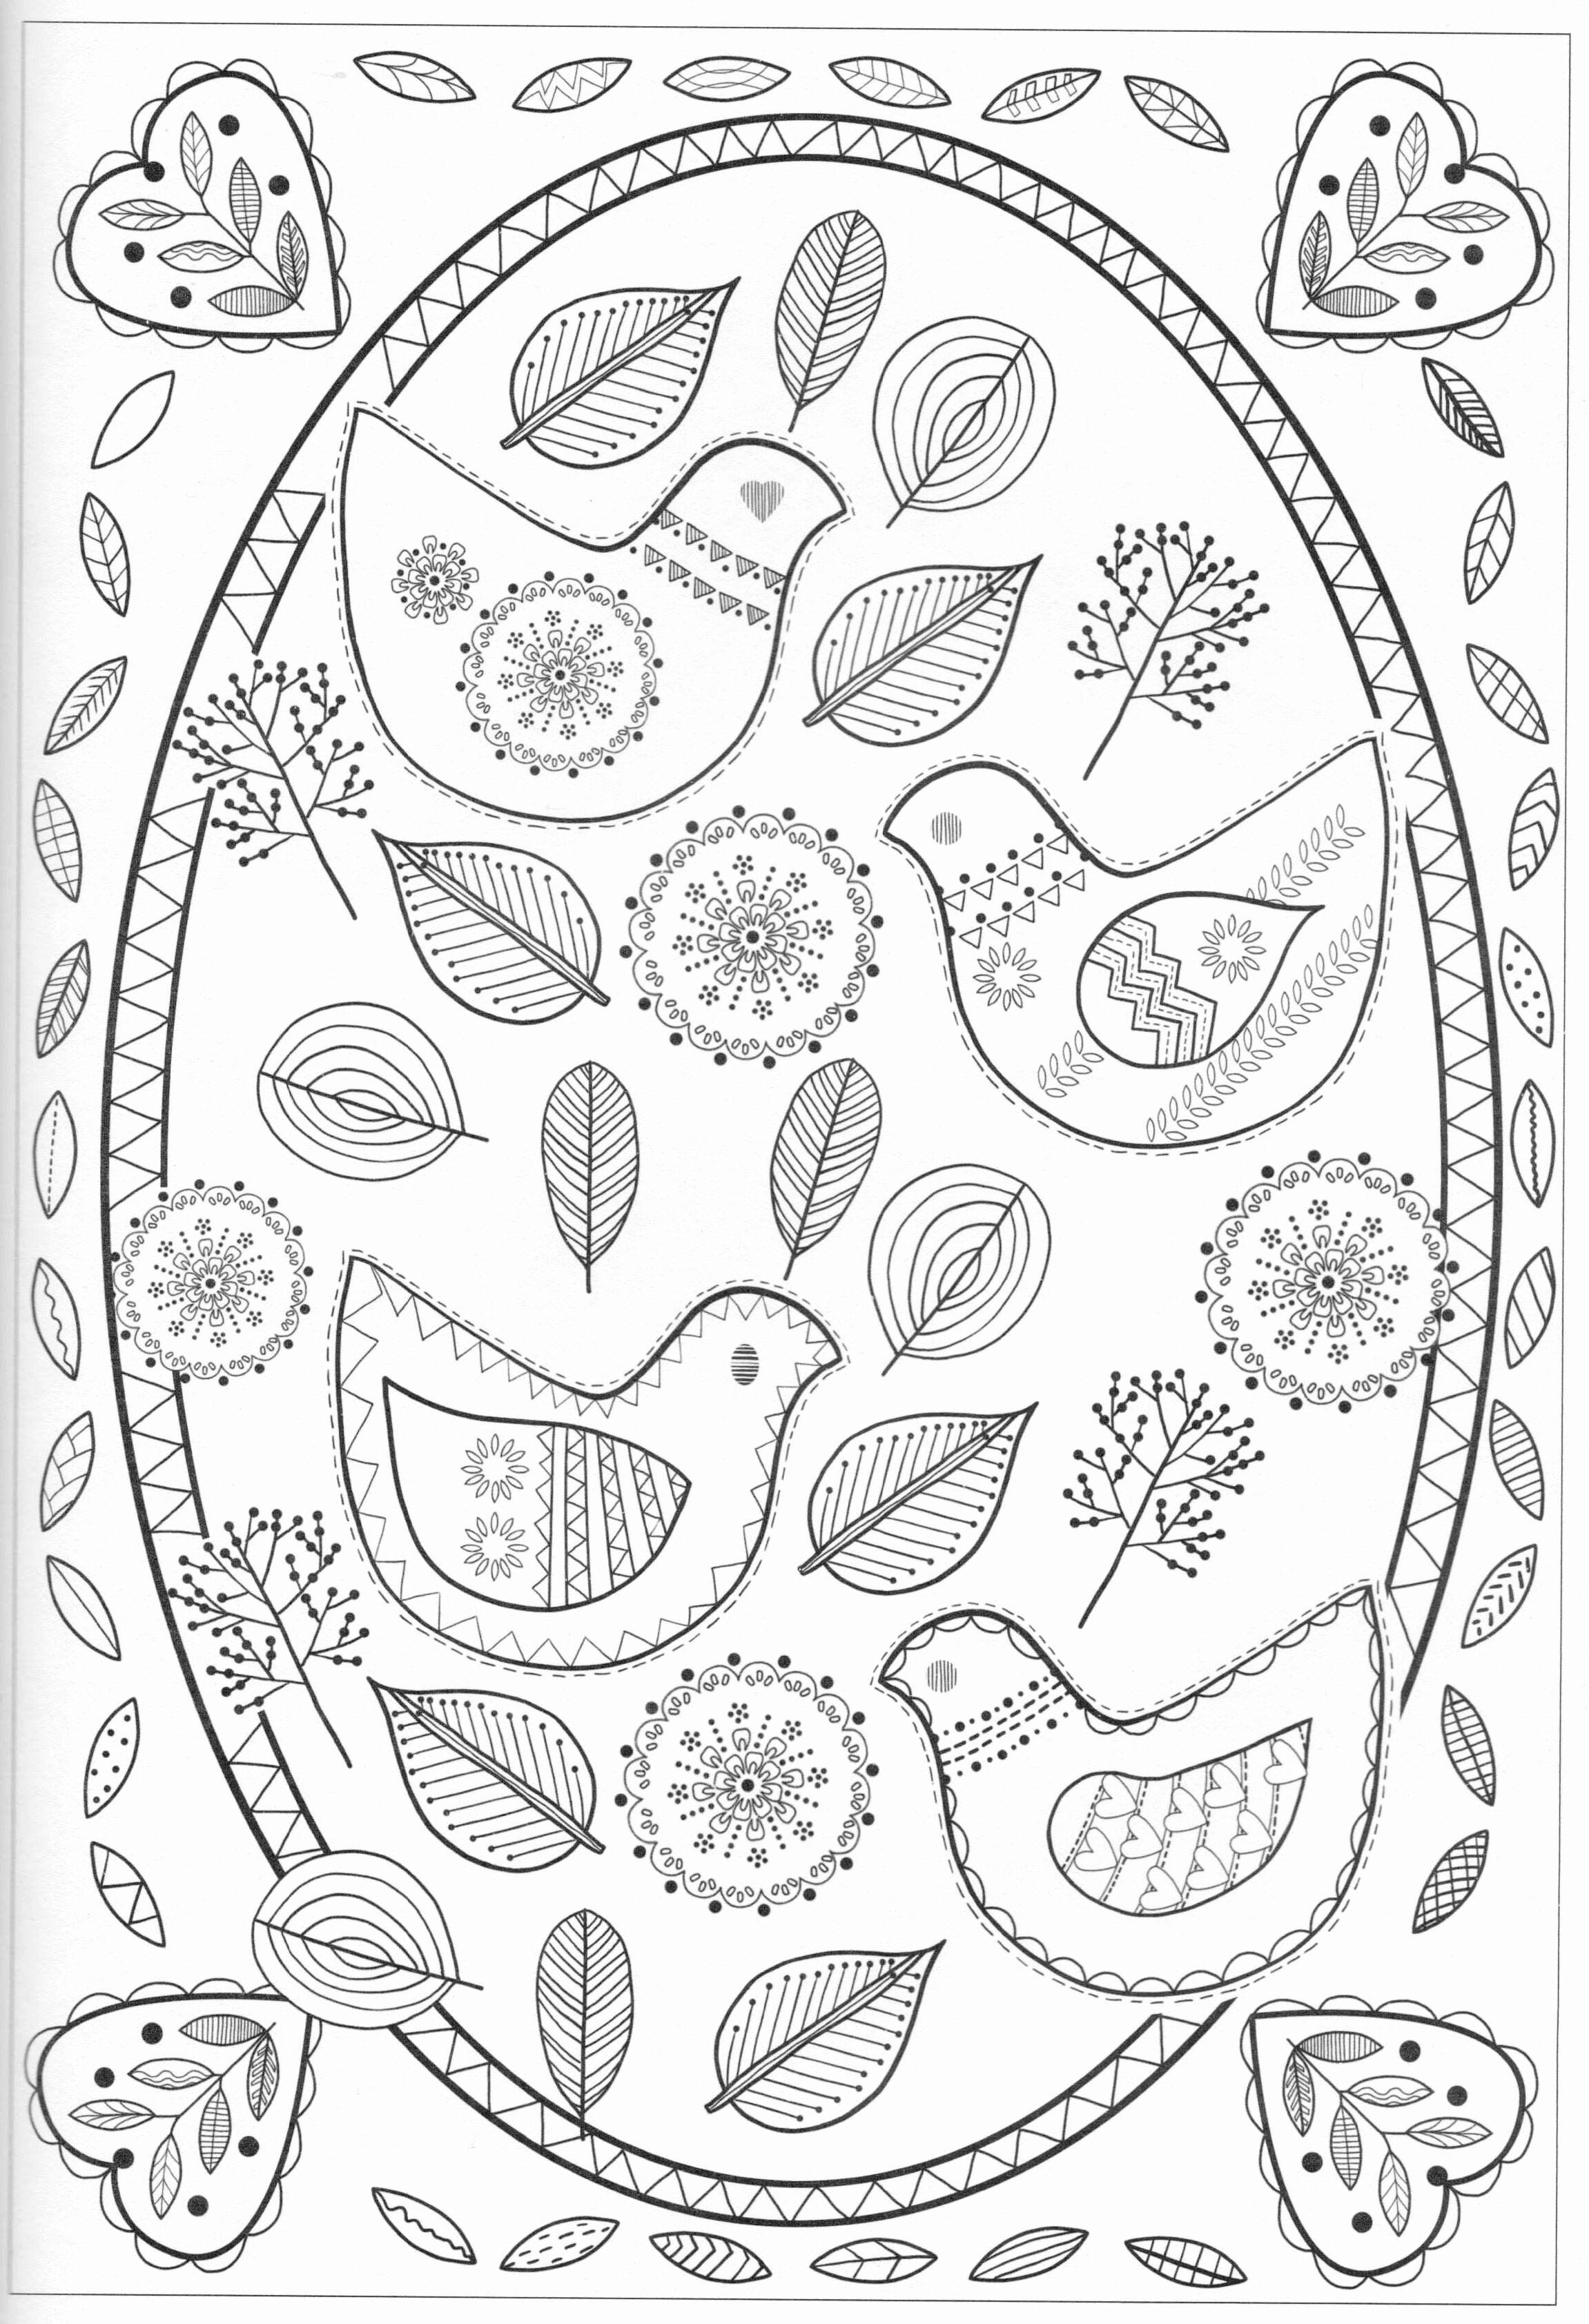 Crayon Coloring Pages Printable New Animal To Color Beautiful Crayola Free Coloring Mandala Coloring Pages Bird Coloring Pages Coloring Books